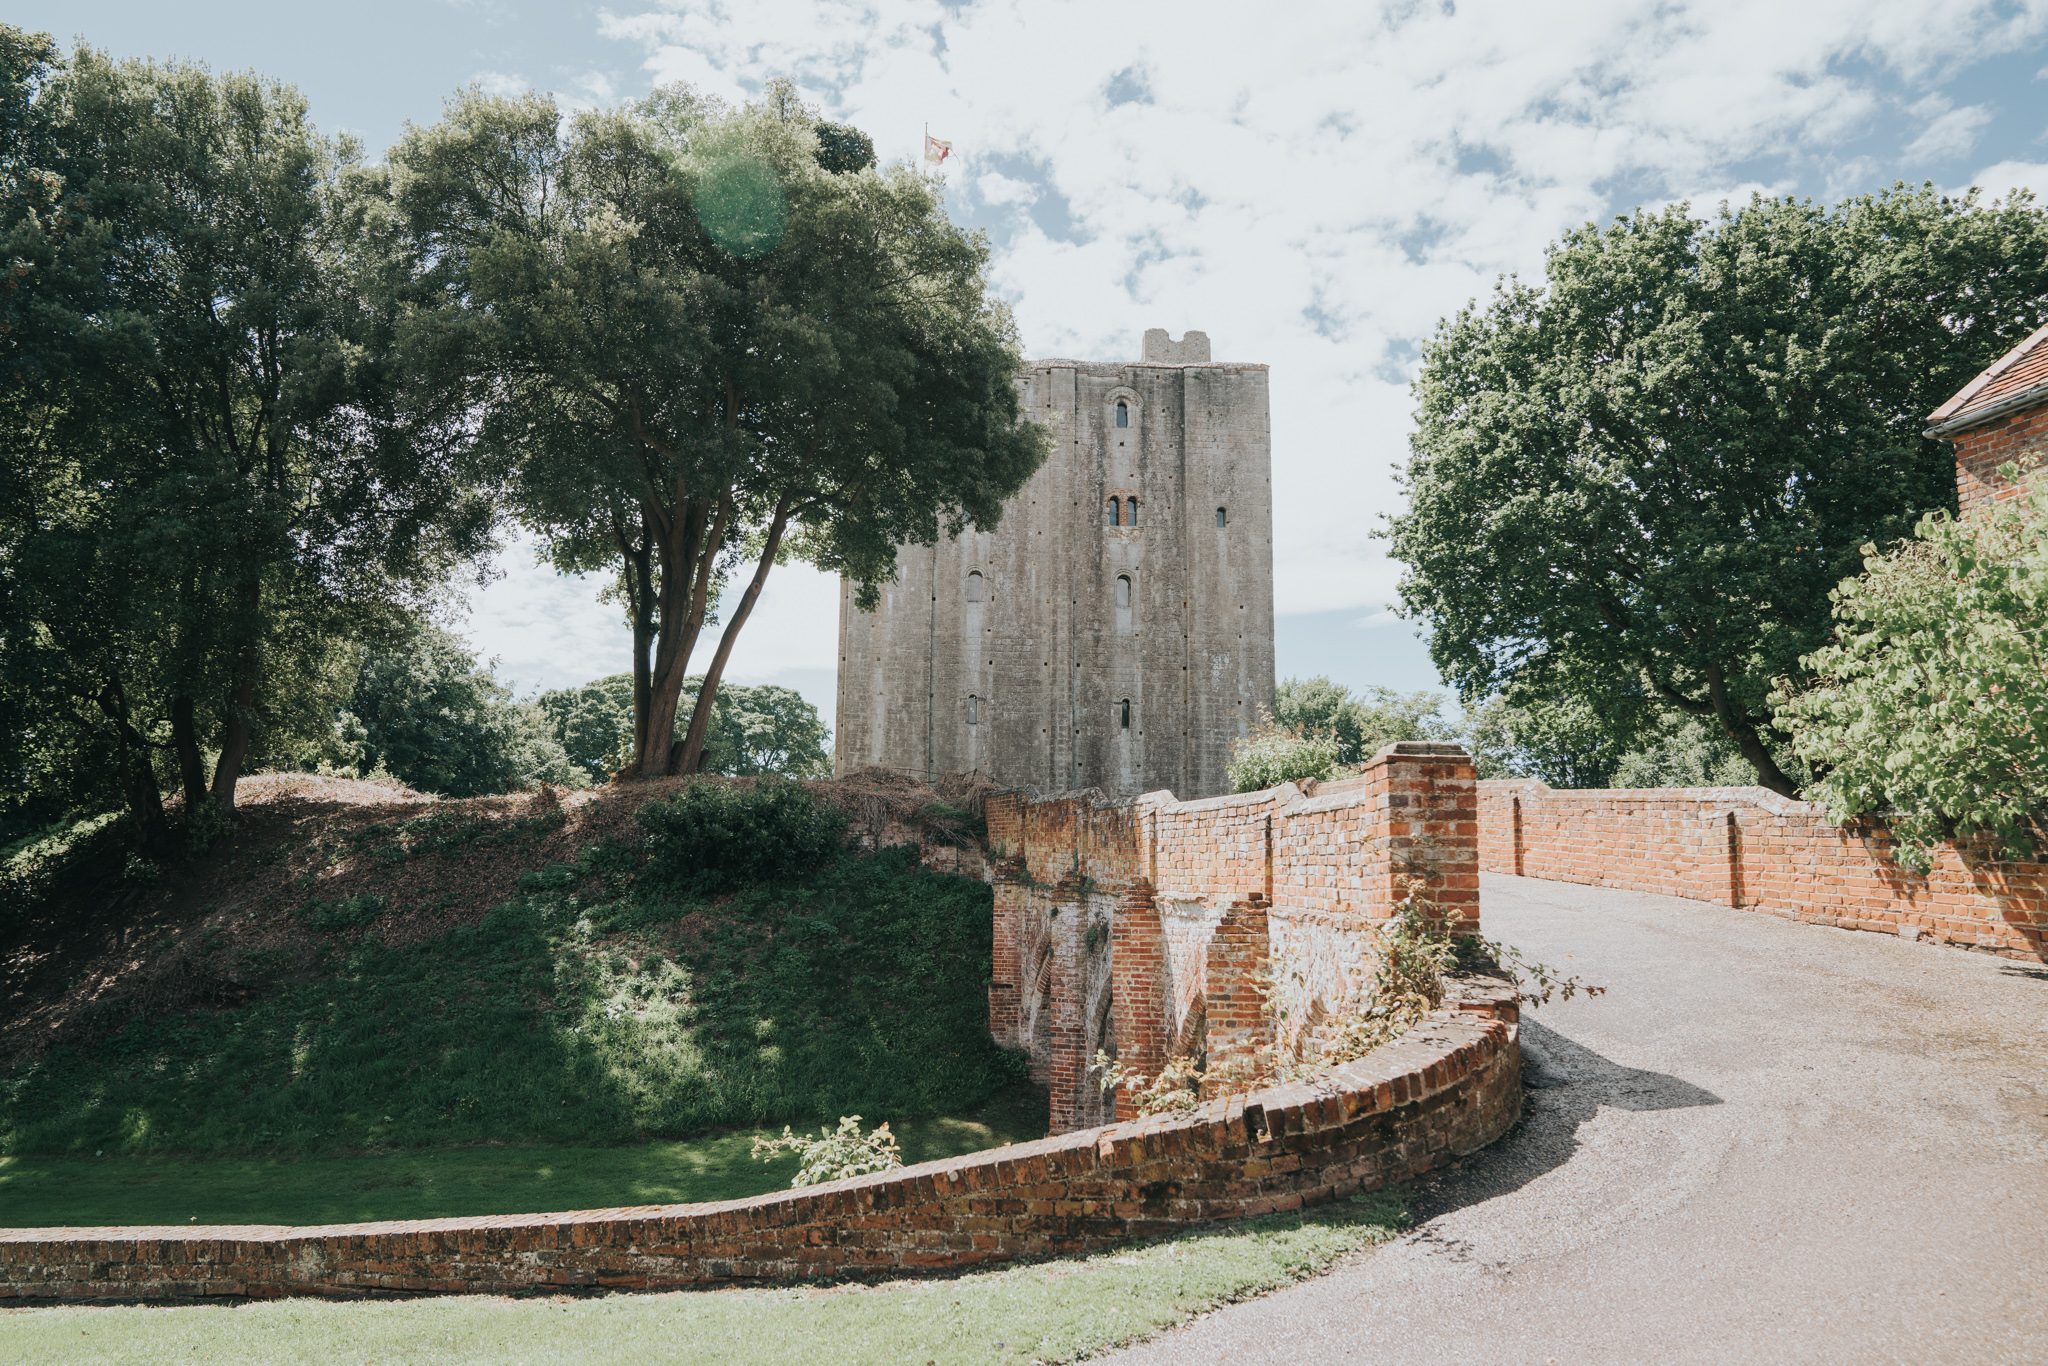 grace-elizabeth-boho-wedding-headingham-castle-essex-wedding-photographer-3.jpg